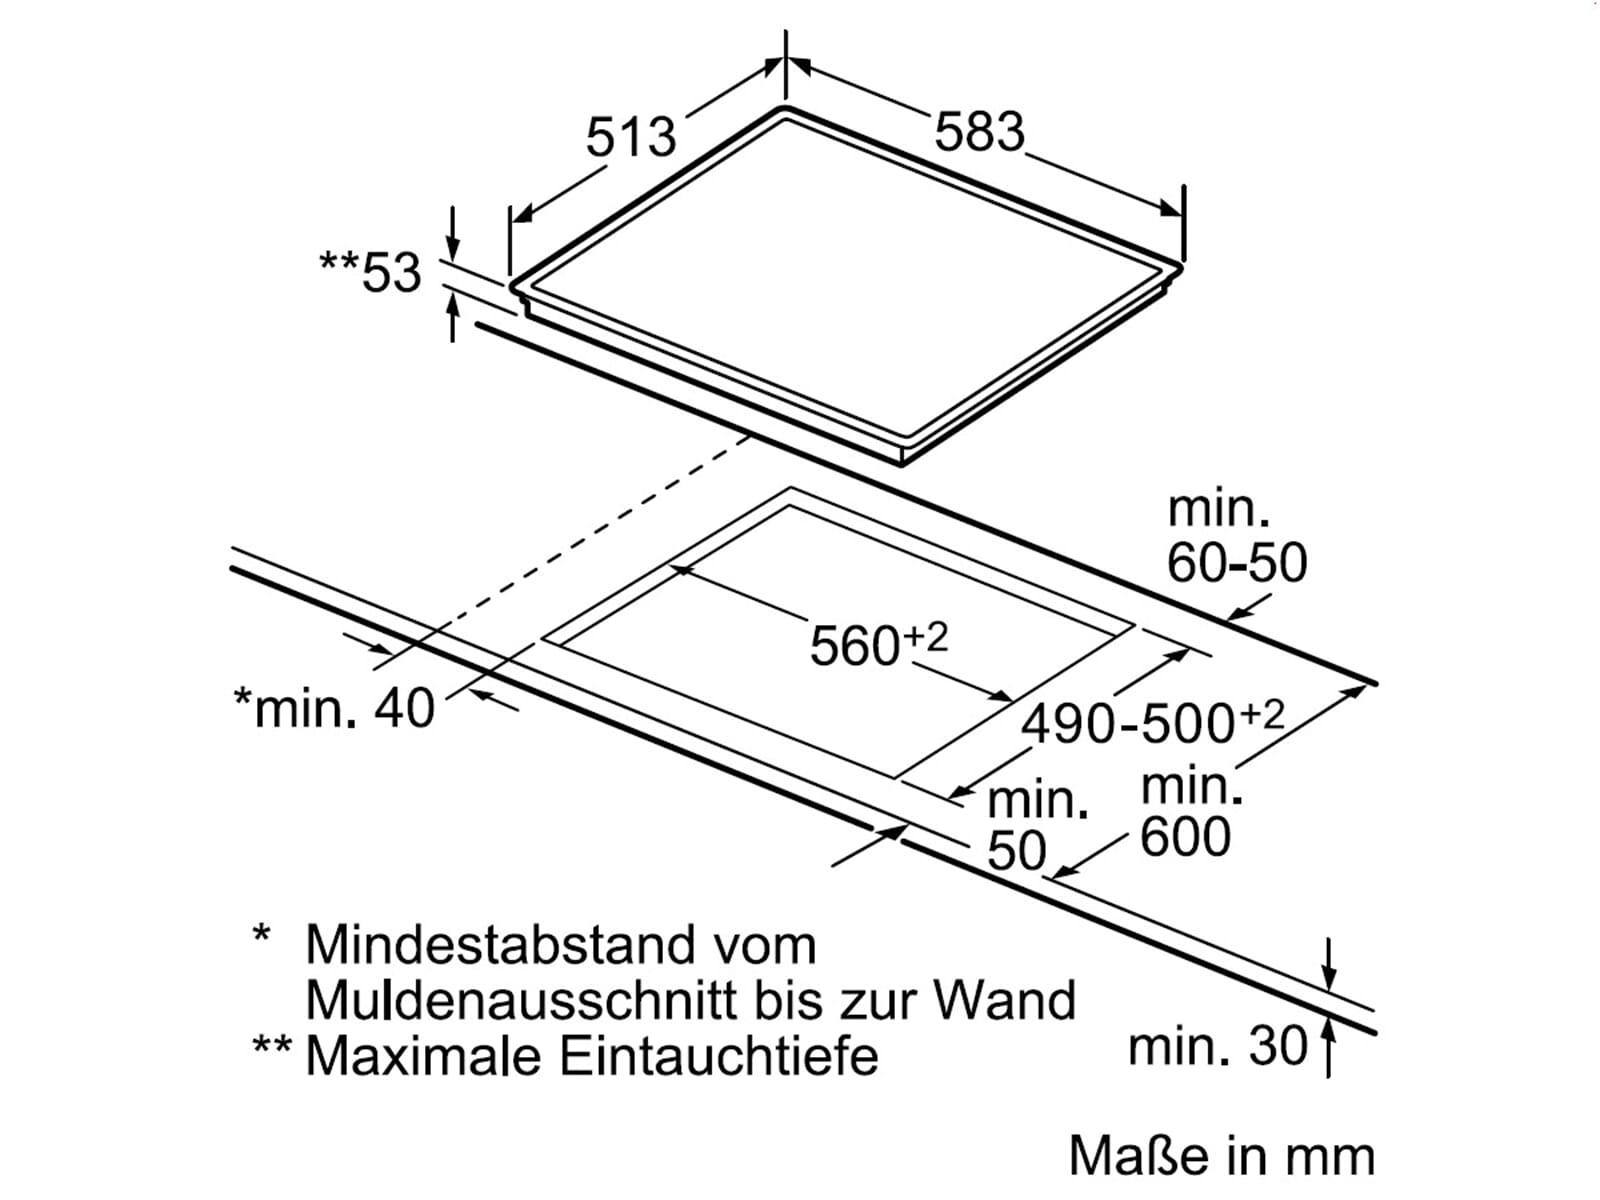 bosch hnd51pr50 set einbauherd hea53t151 induktion glaskeramik kochfeld nib645b17e artikelnummer. Black Bedroom Furniture Sets. Home Design Ideas